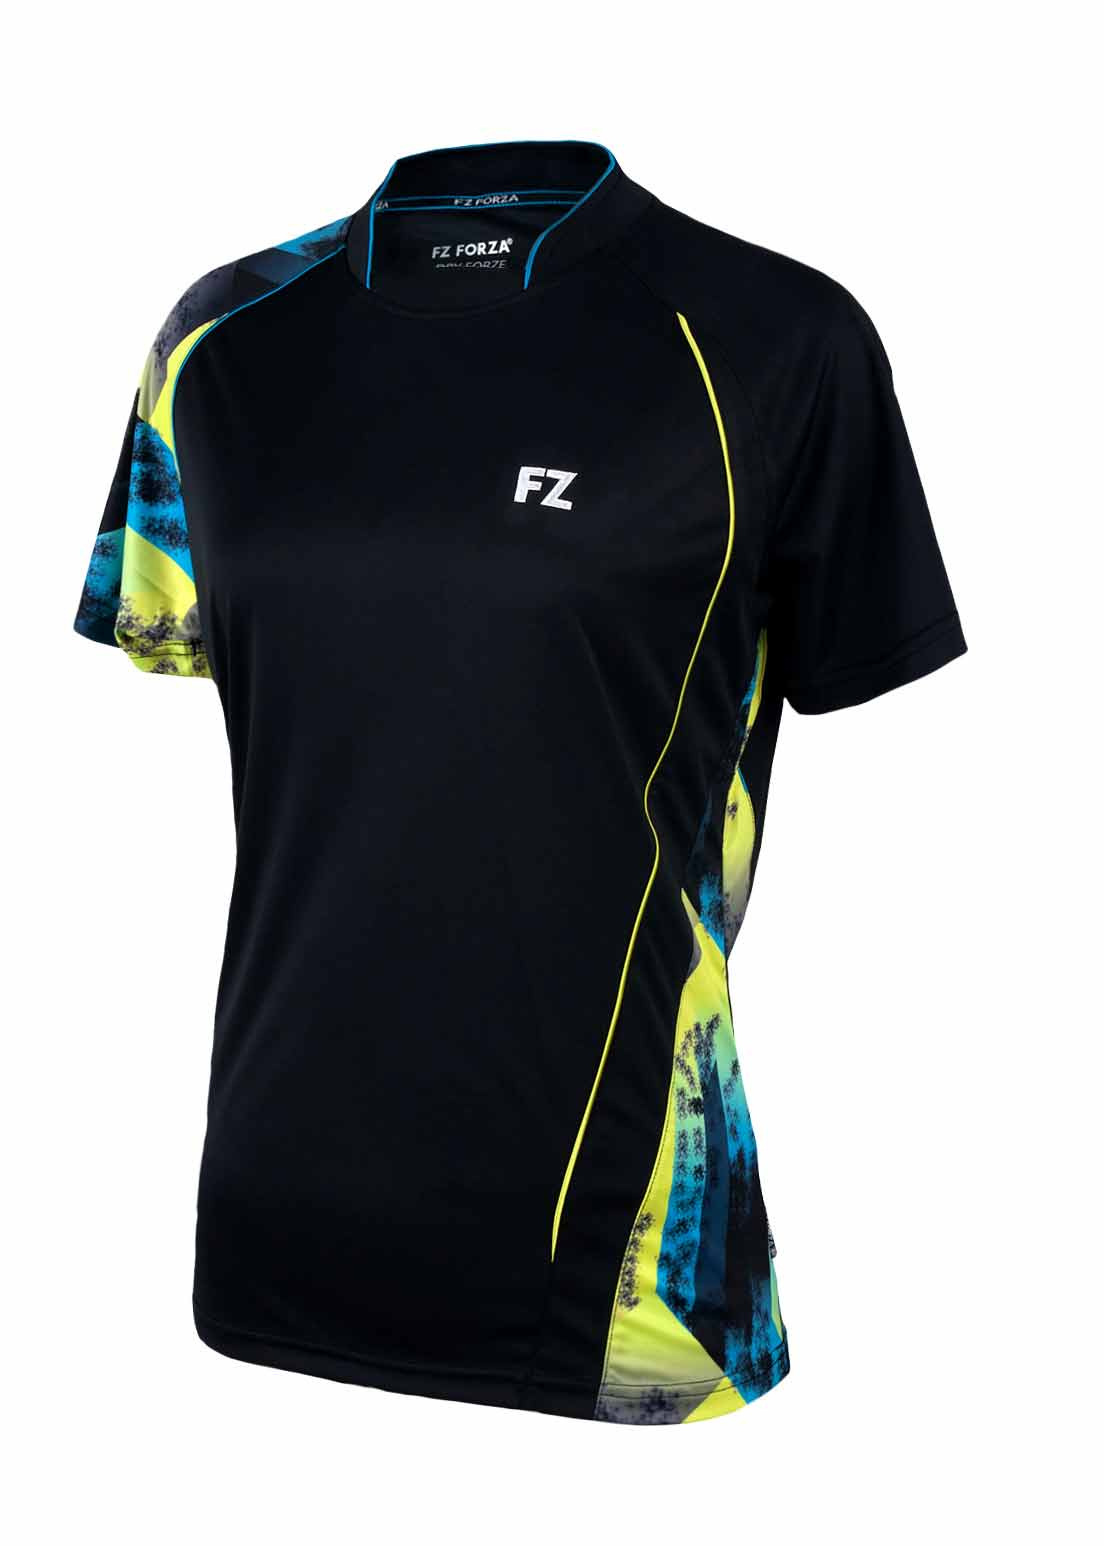 Forza molly t-shirt fra Forza fra billigsport24